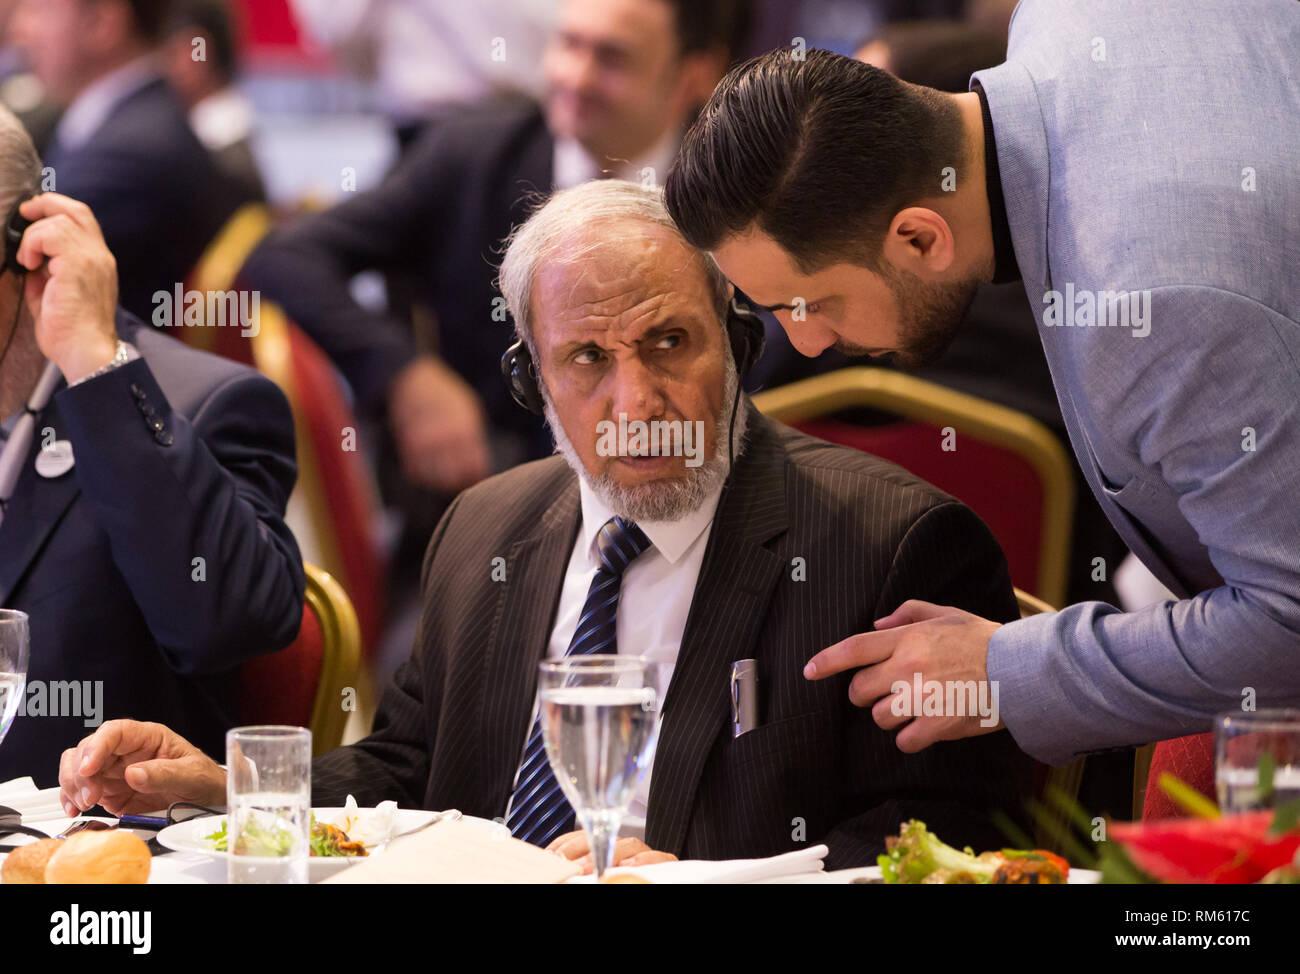 Mahmoud al-Zahar, a co-founder of Hamas and a member of the Hamas leadership in the Gaza Strip - Stock Image